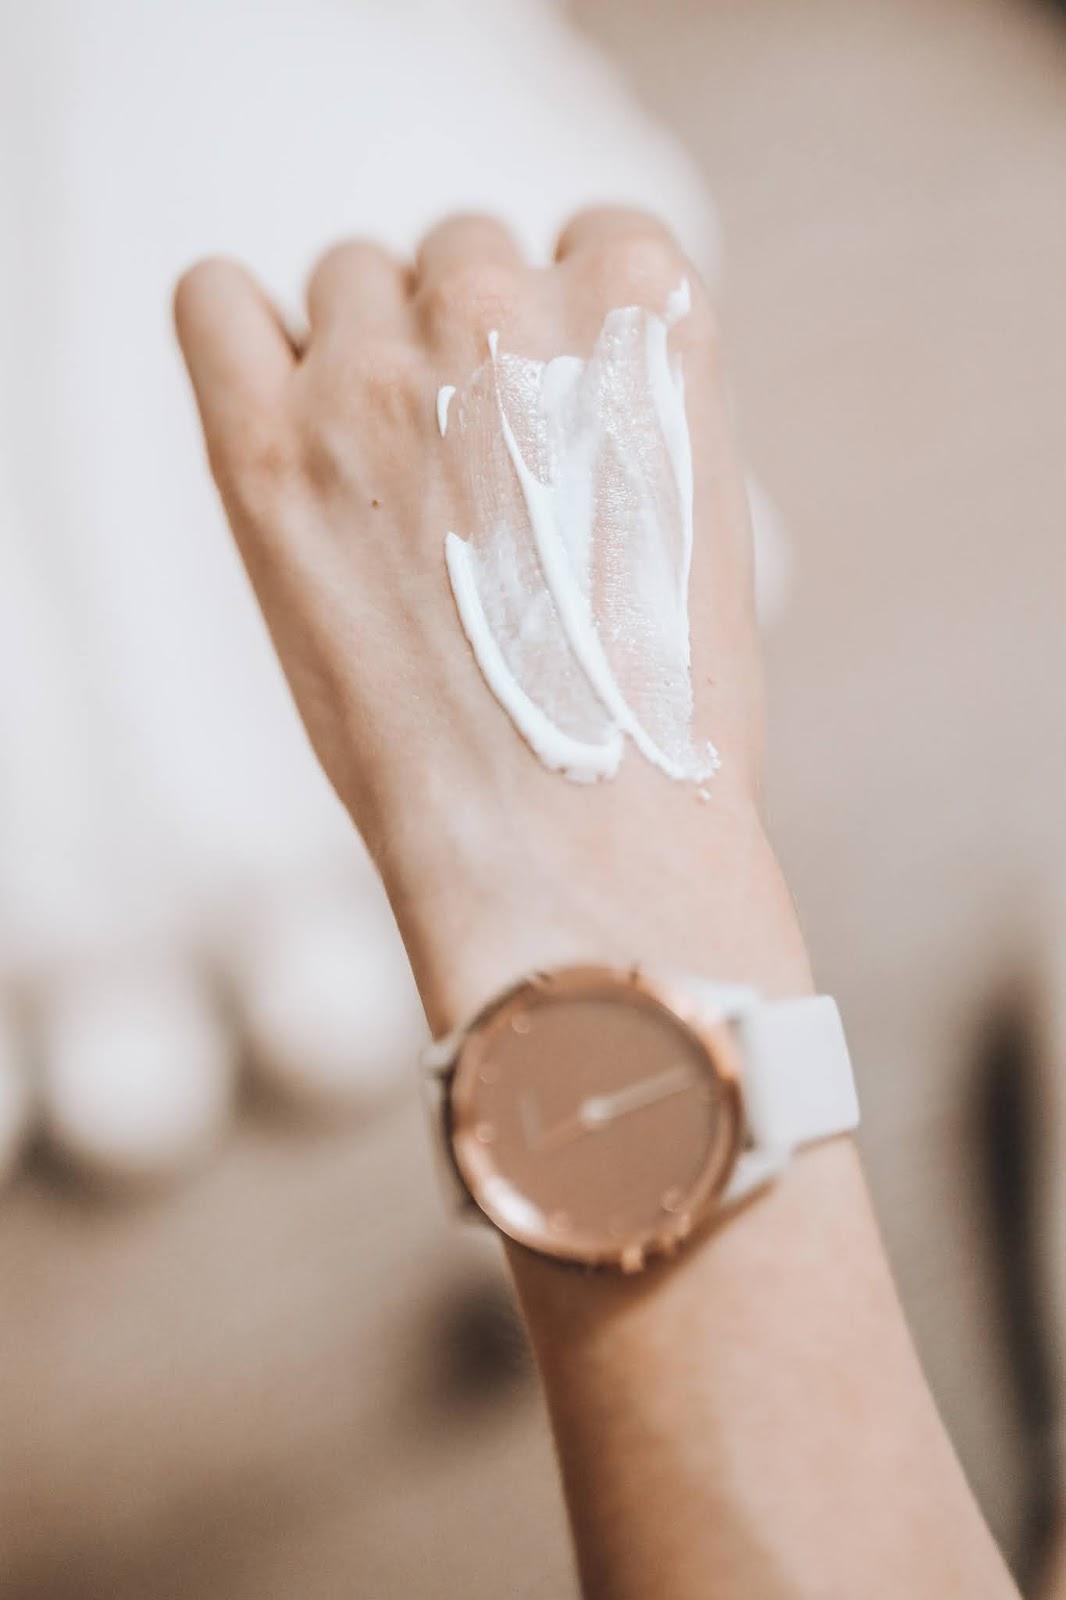 Charlotte tilbury magic cream light swatch